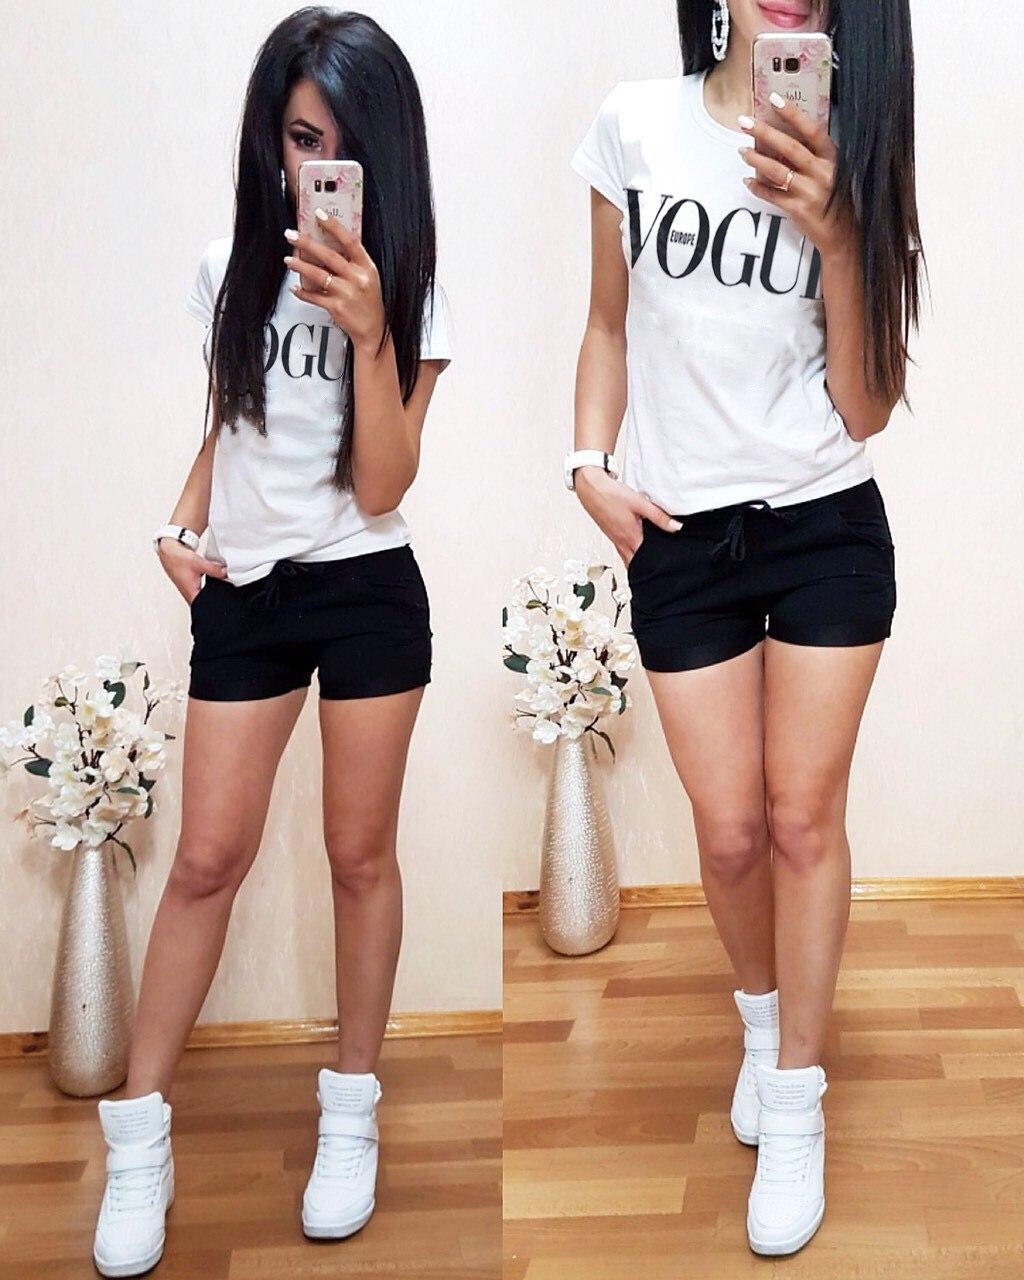 Костюм летний футболка + шорты, размеры s m l xl Турция